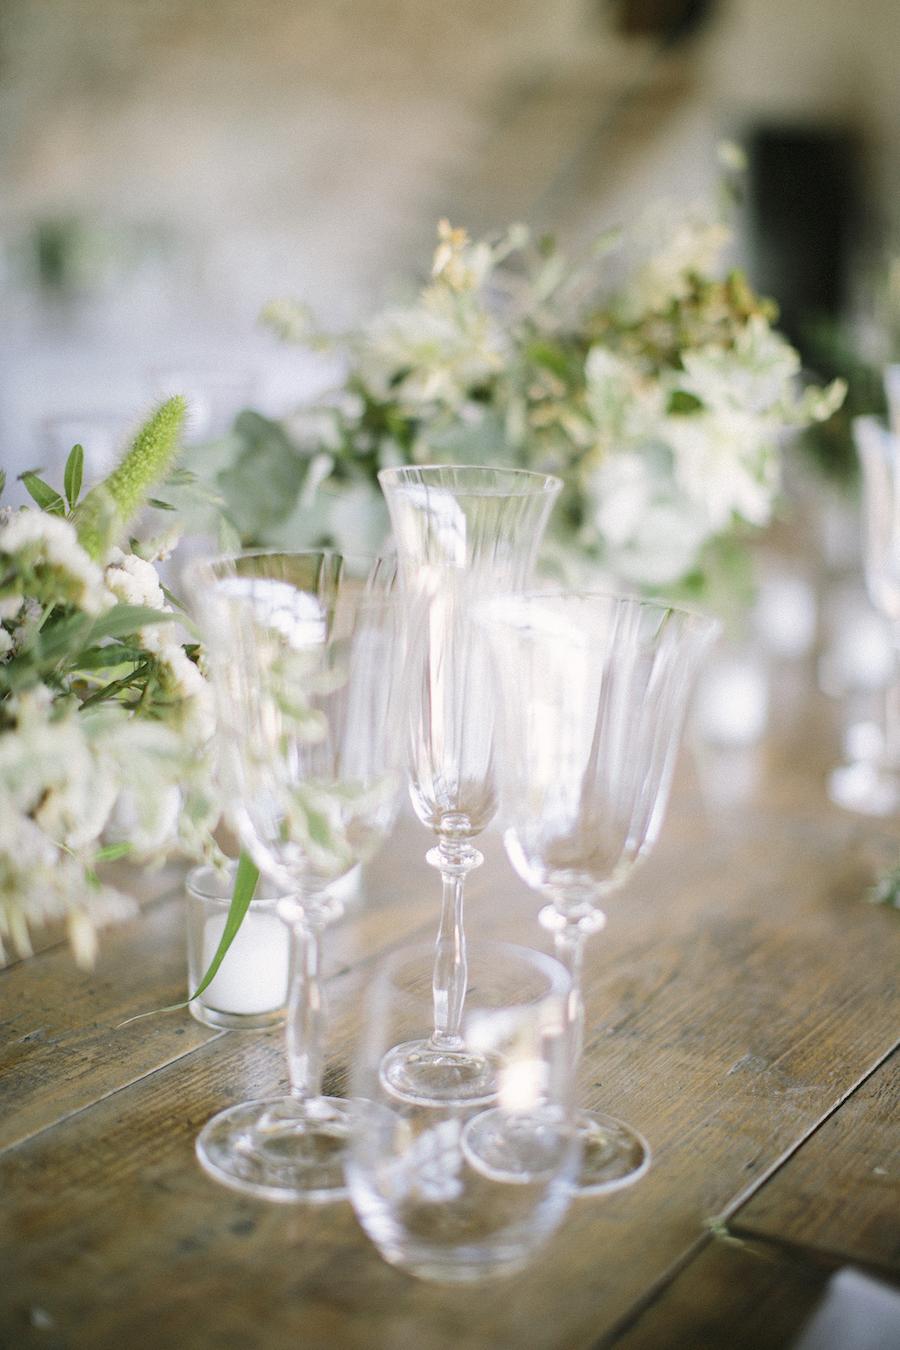 saya-photography-rustic-french-wedding-provence-domaines-de-patras-64.jpg